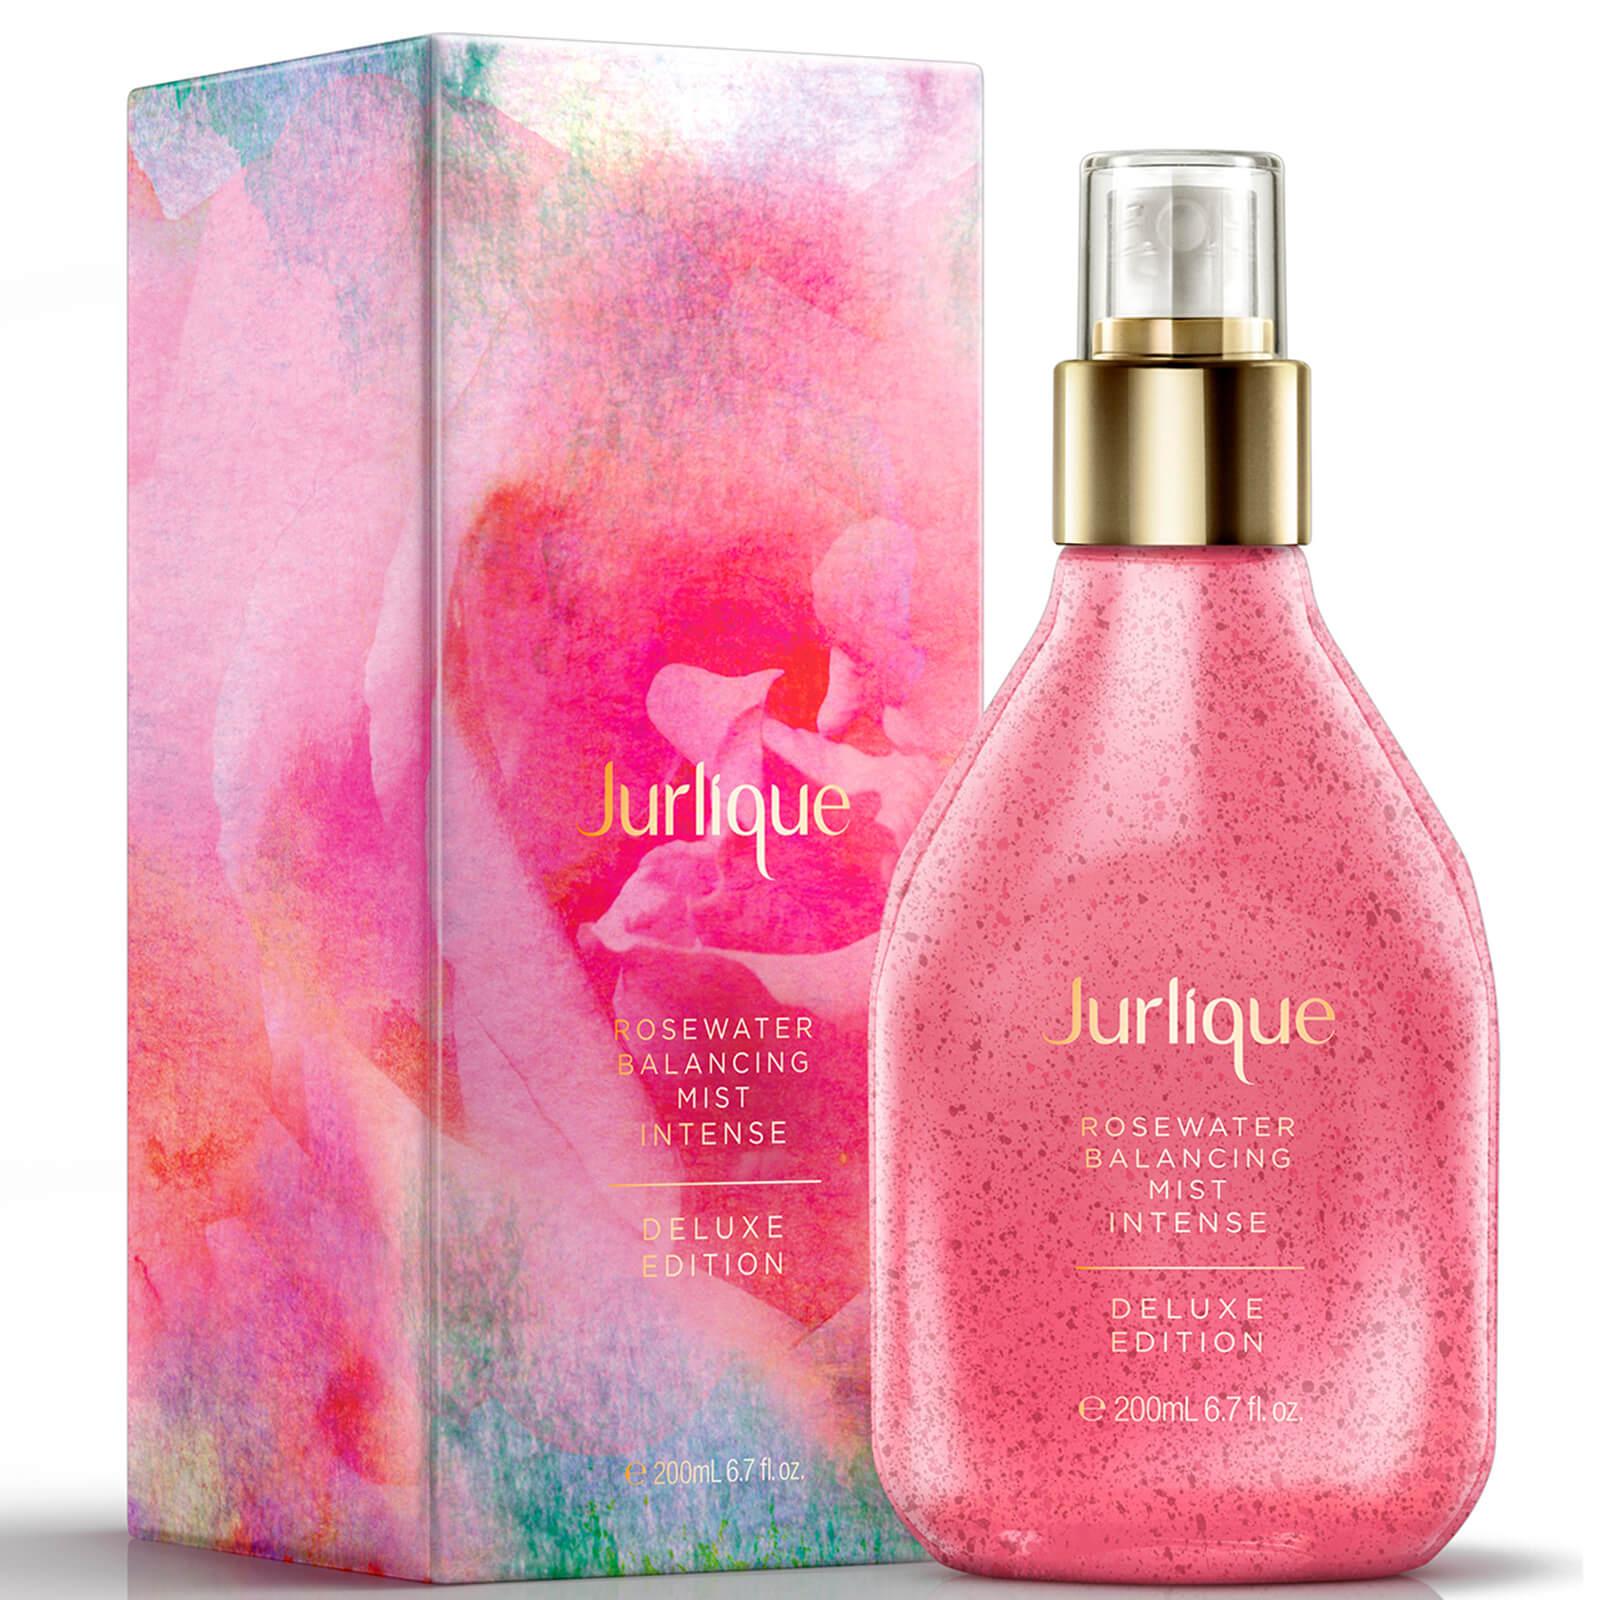 JURLIQUE Rose Hand Cream 40ml + Rosewater Balancing Mist 50ml ORGANIC SKINCARE